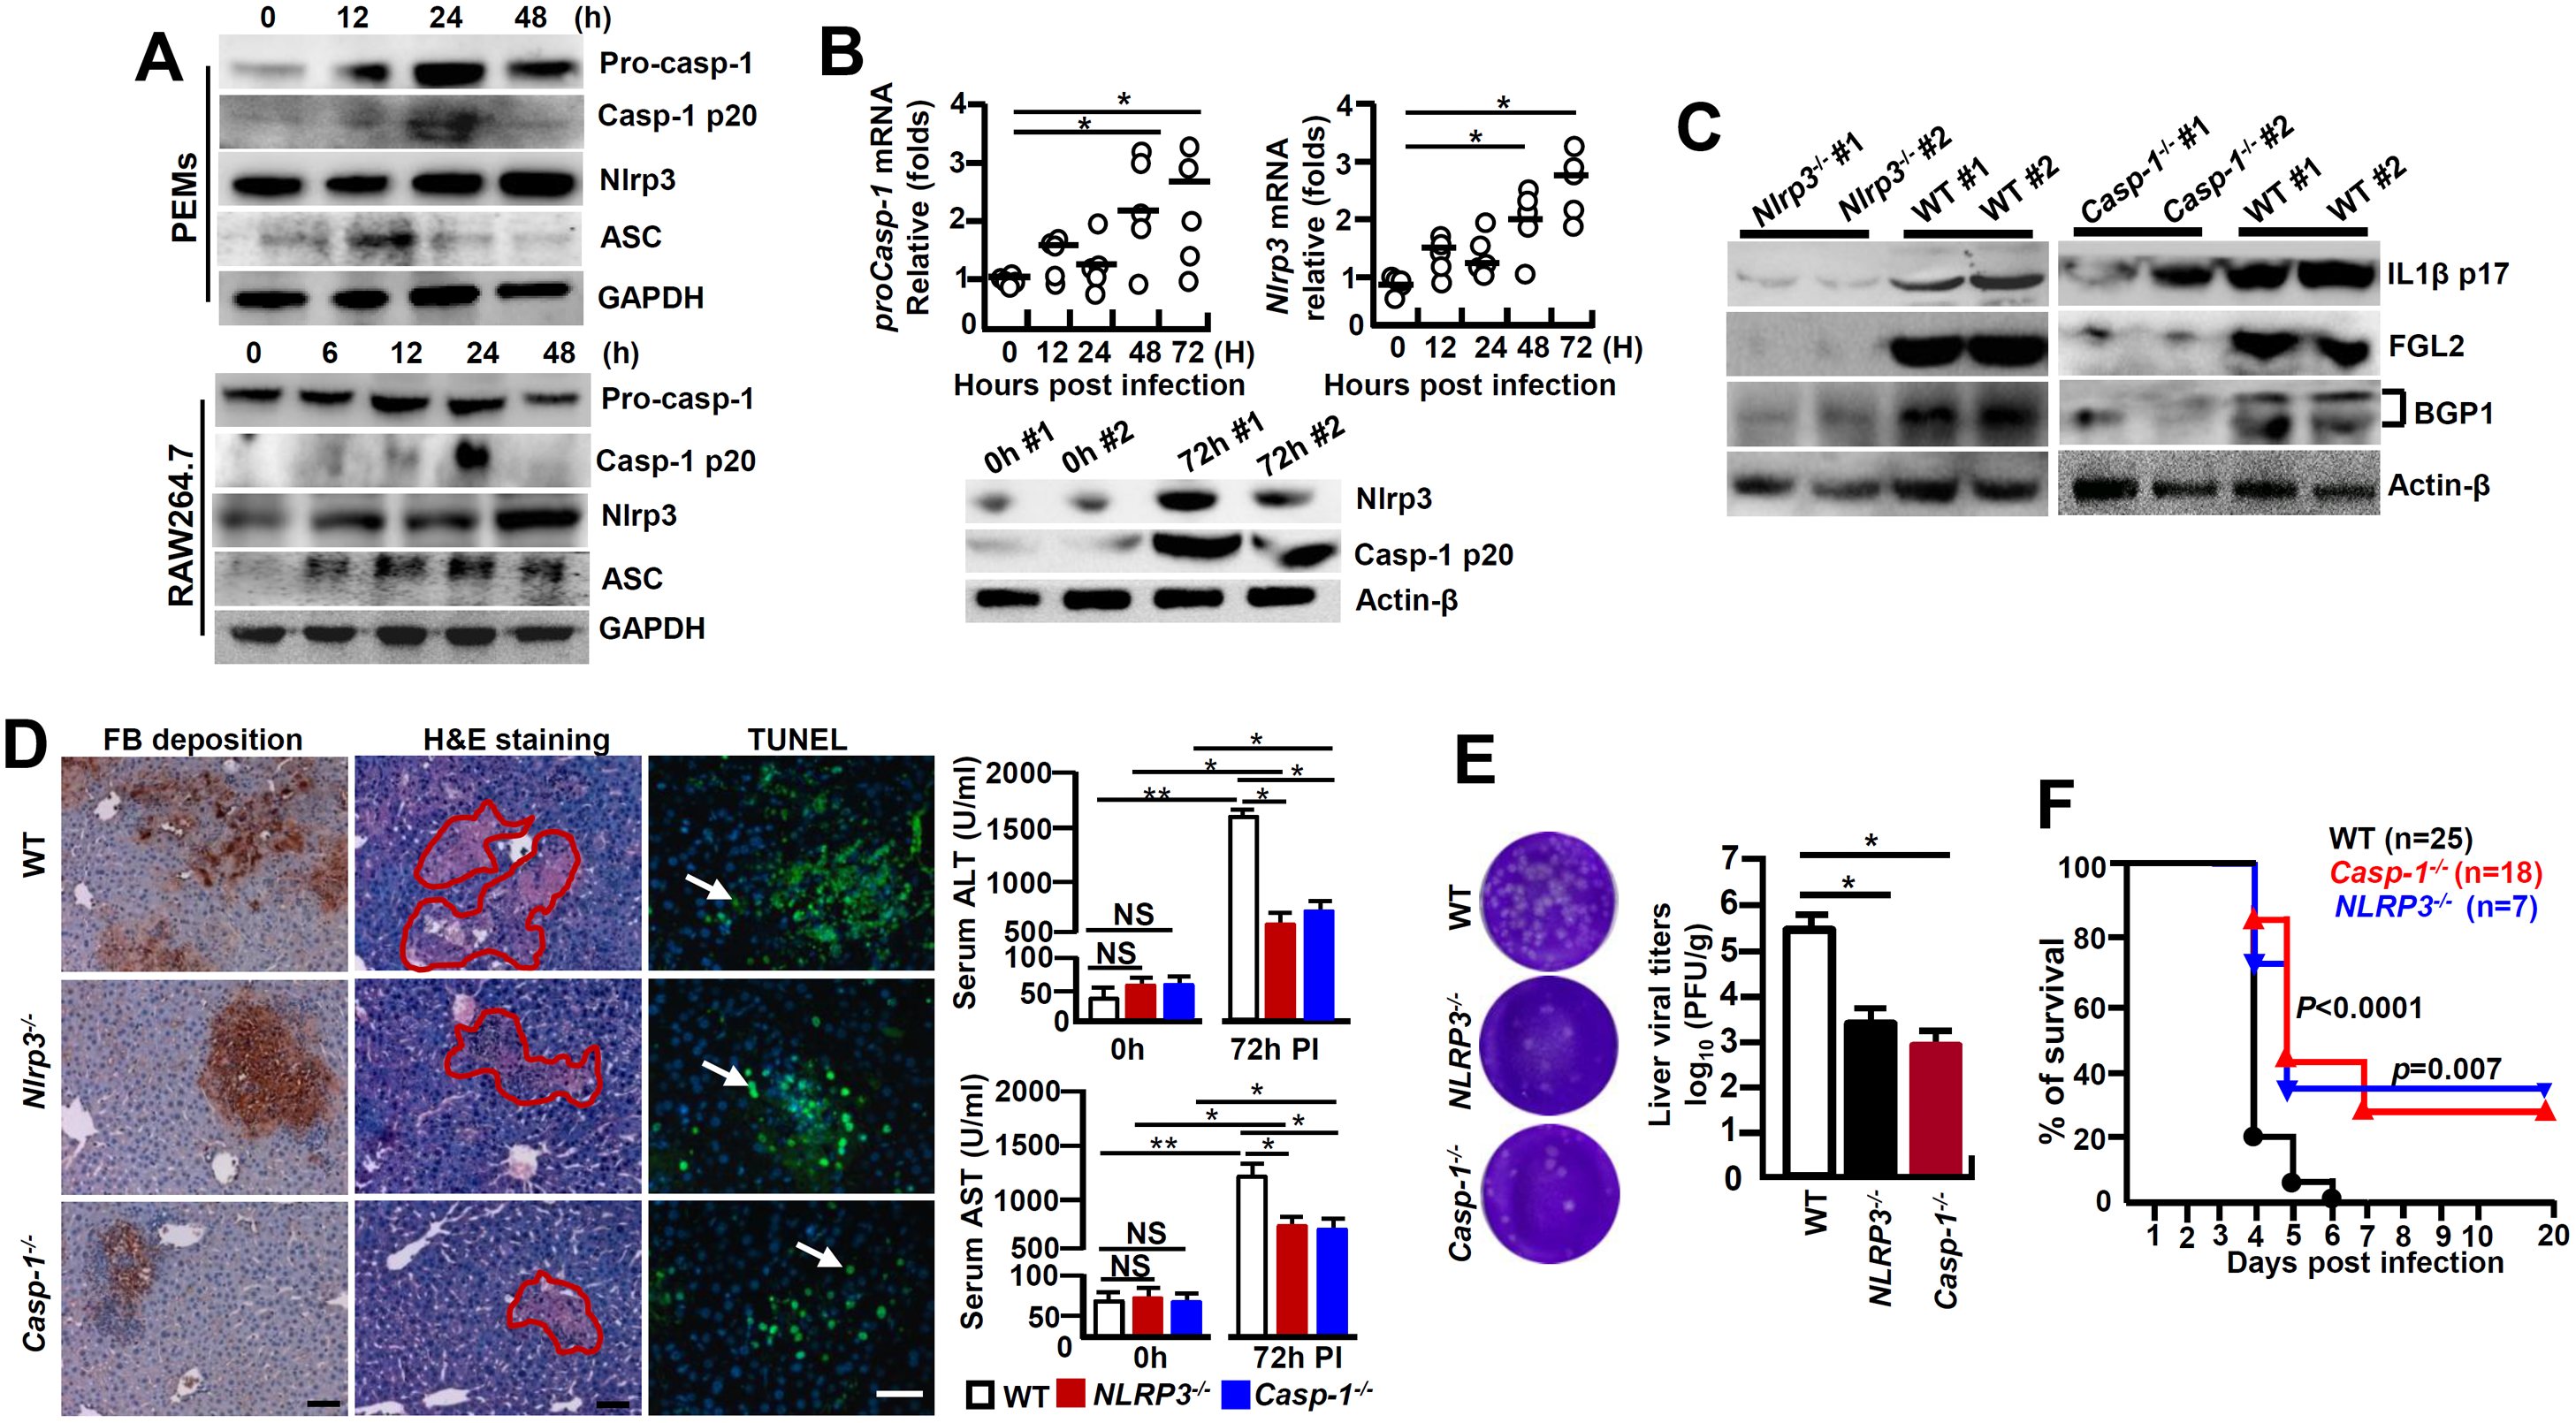 NLRP3 inflammasome involves in regulating the pathogenesis of MHV-3-mediated hepatitis.